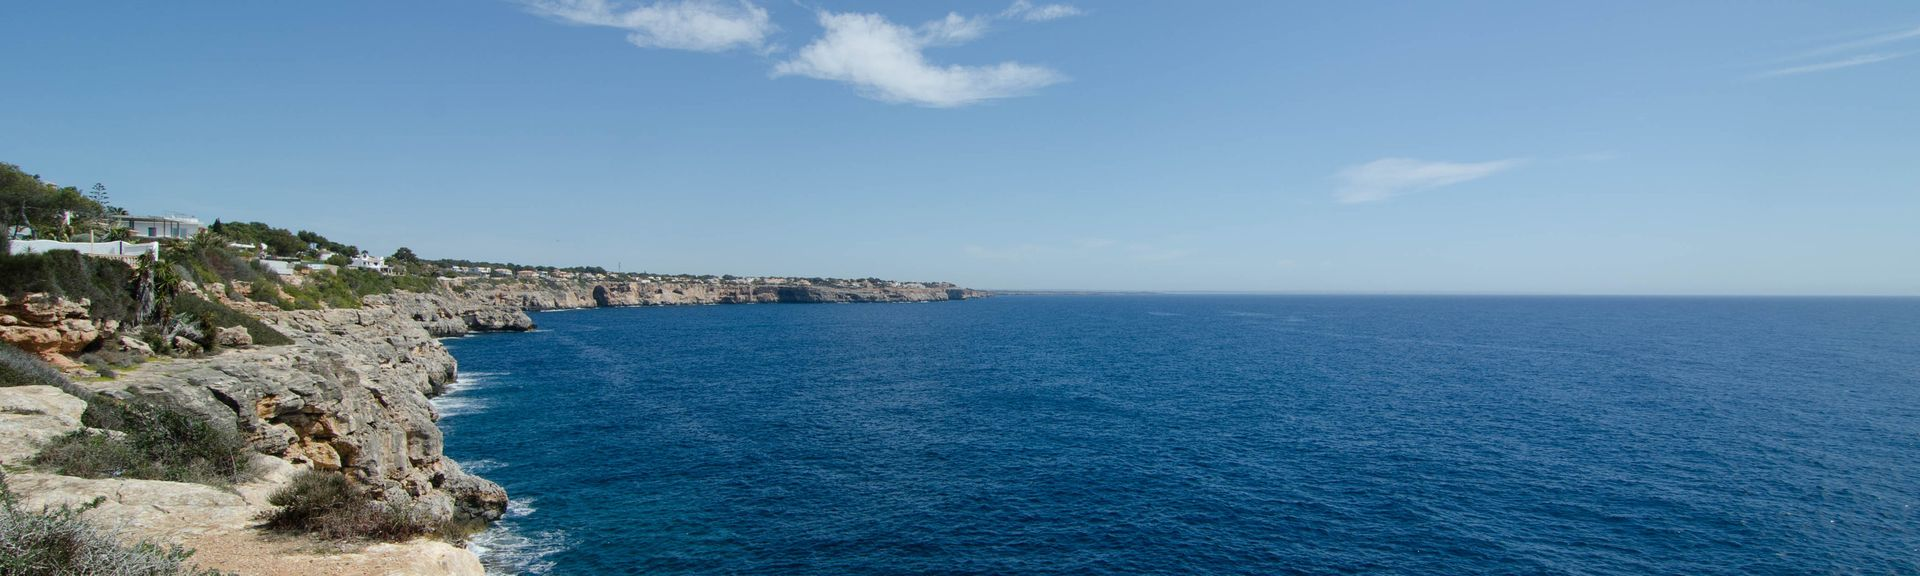 Sa Torre, Llucmajor, Islas Baleares, España